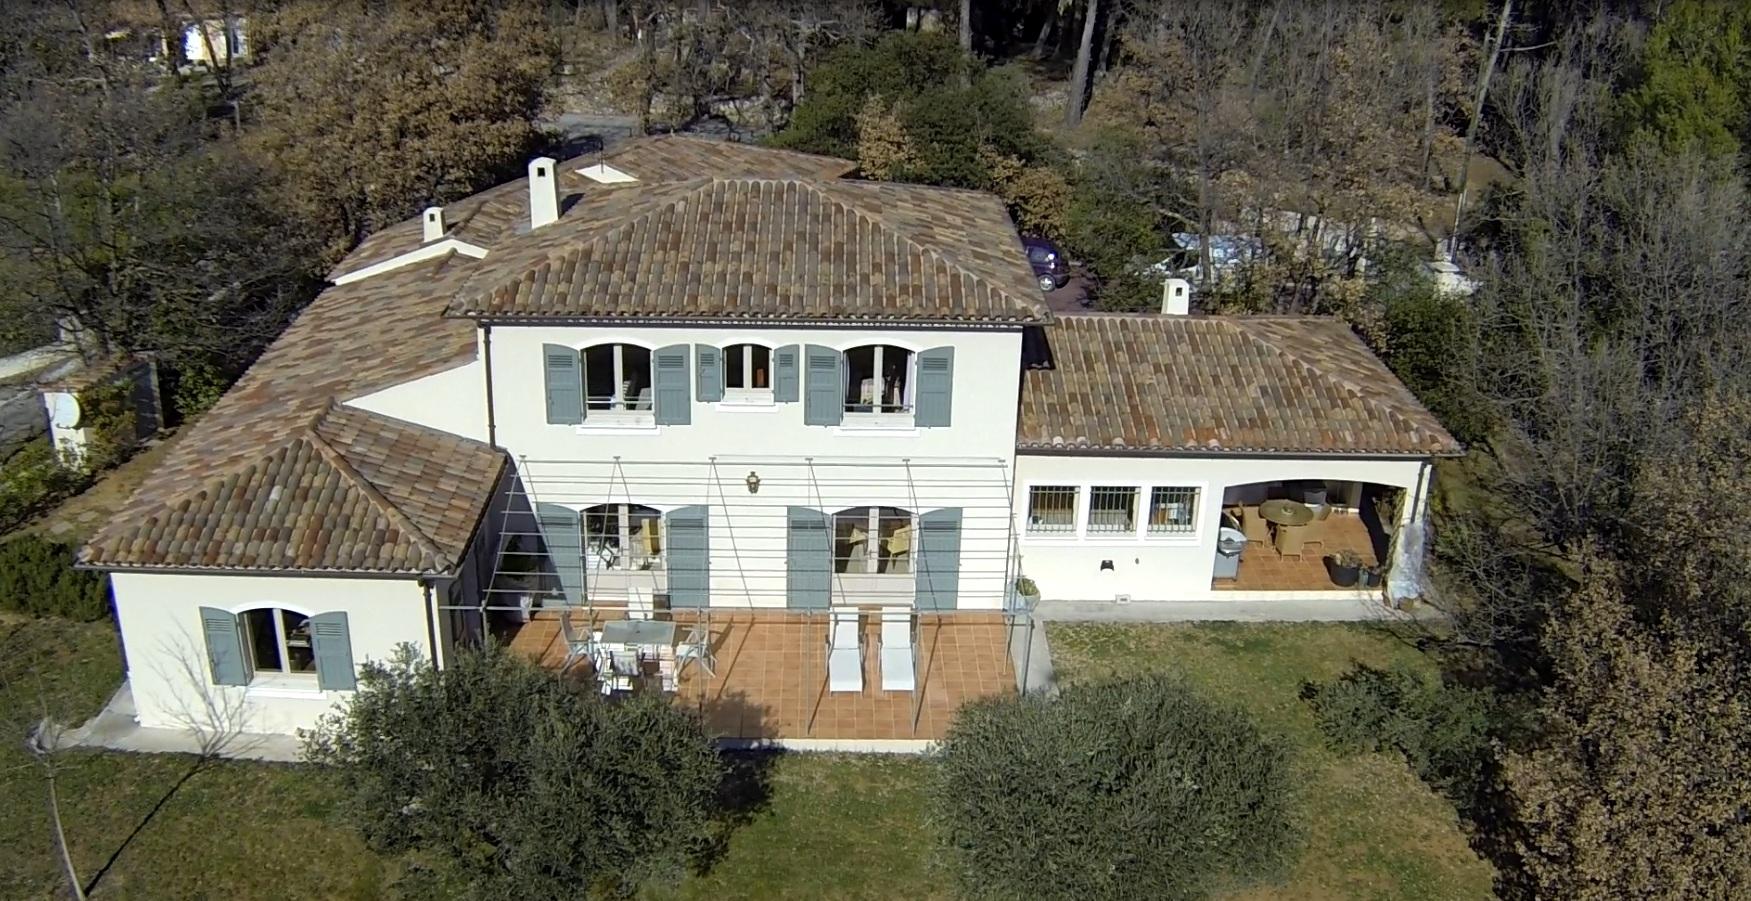 Single Family Home for Sale at Three superb villas Draguignan, Provence-Alpes-Cote D'Azur 83300 France